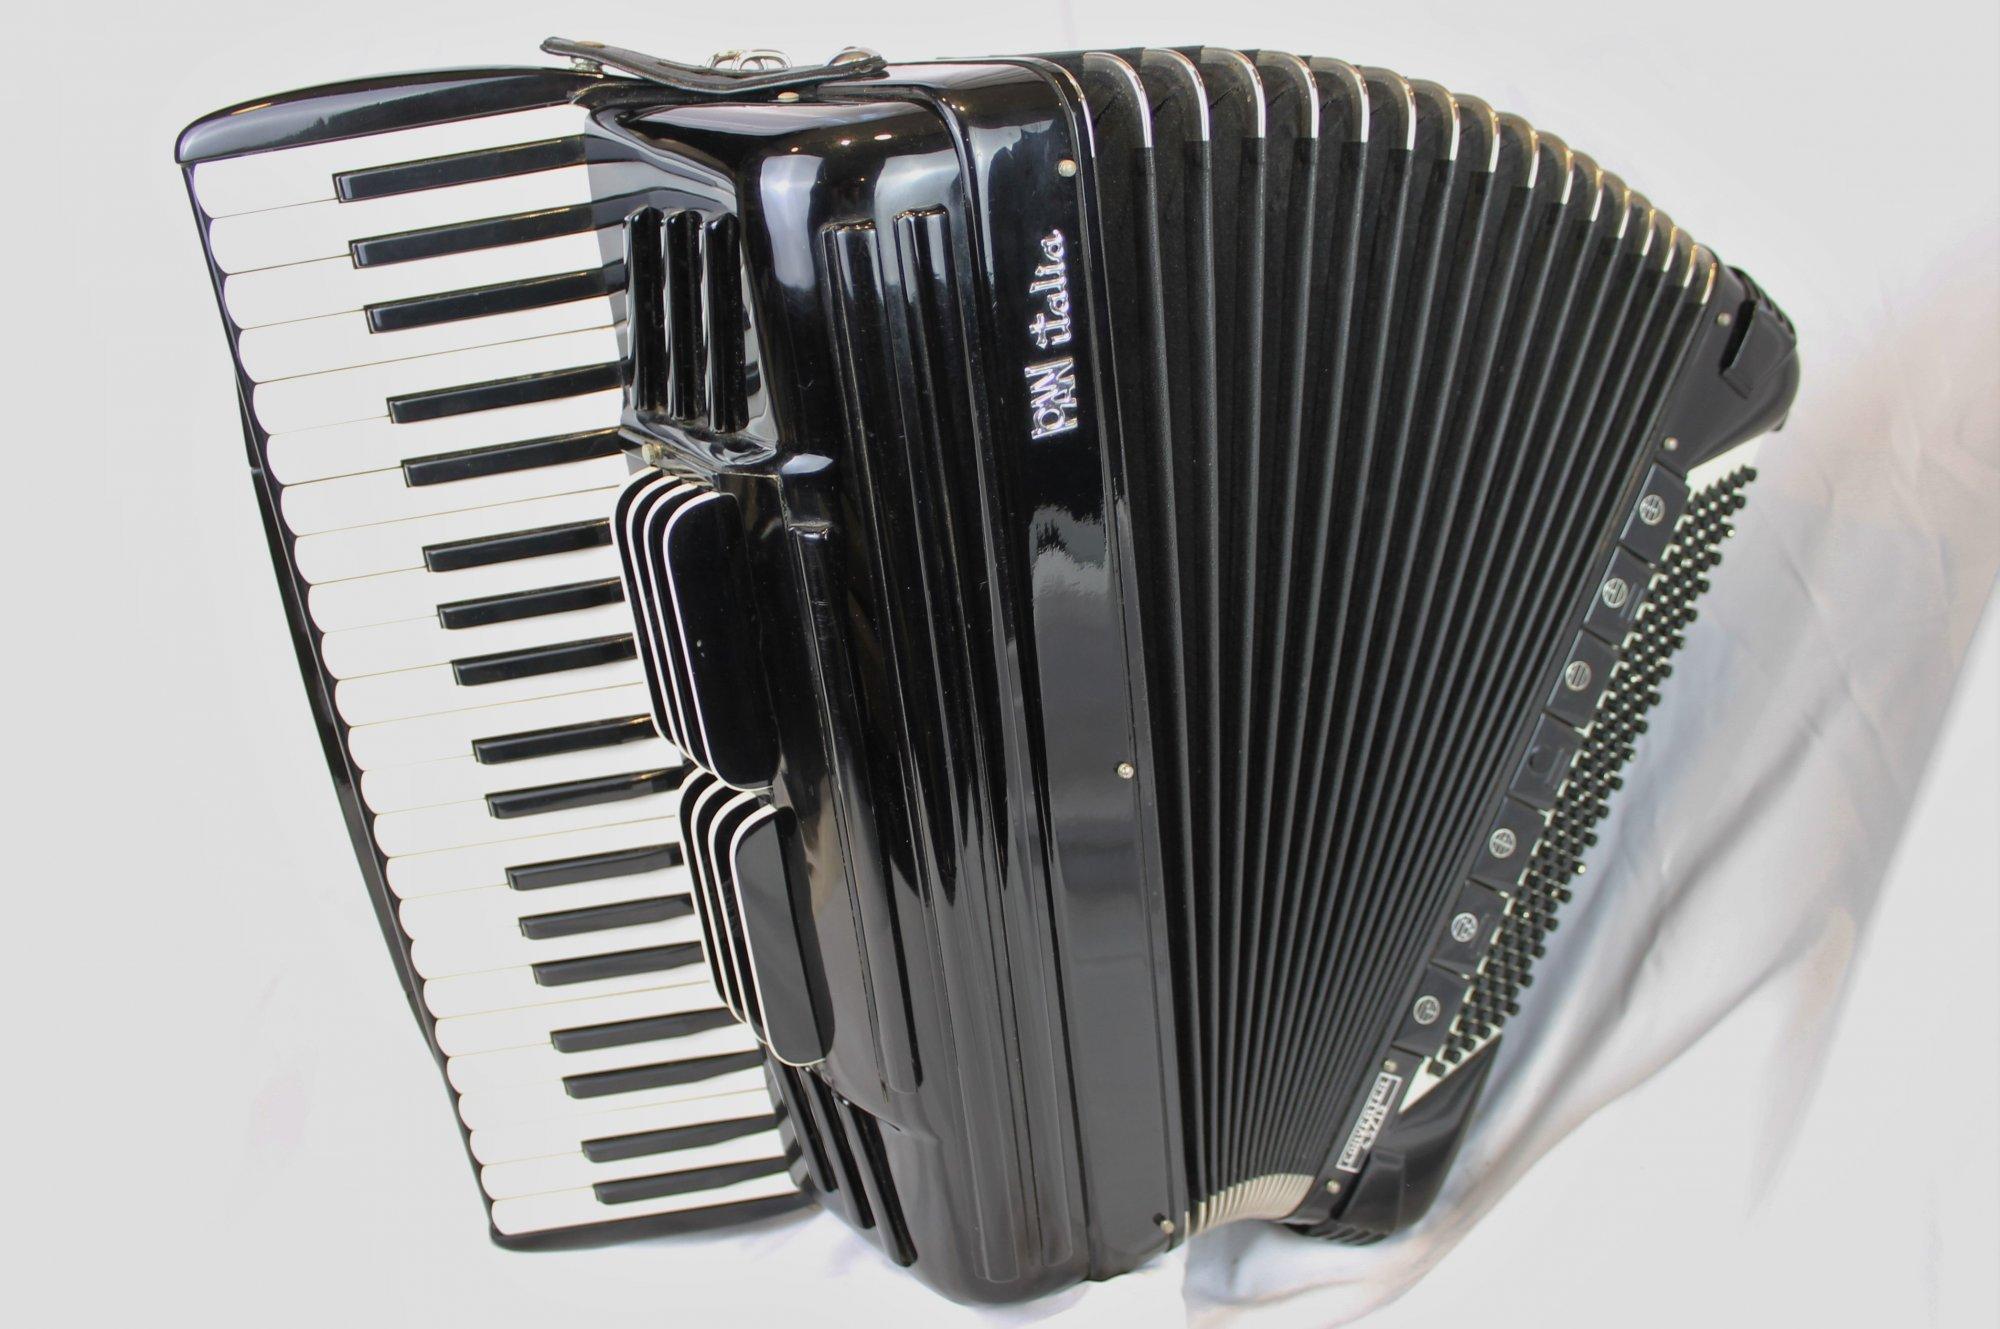 4259 - Black PanItalia Converter 45/19 Piano Accordion LMH 41 120